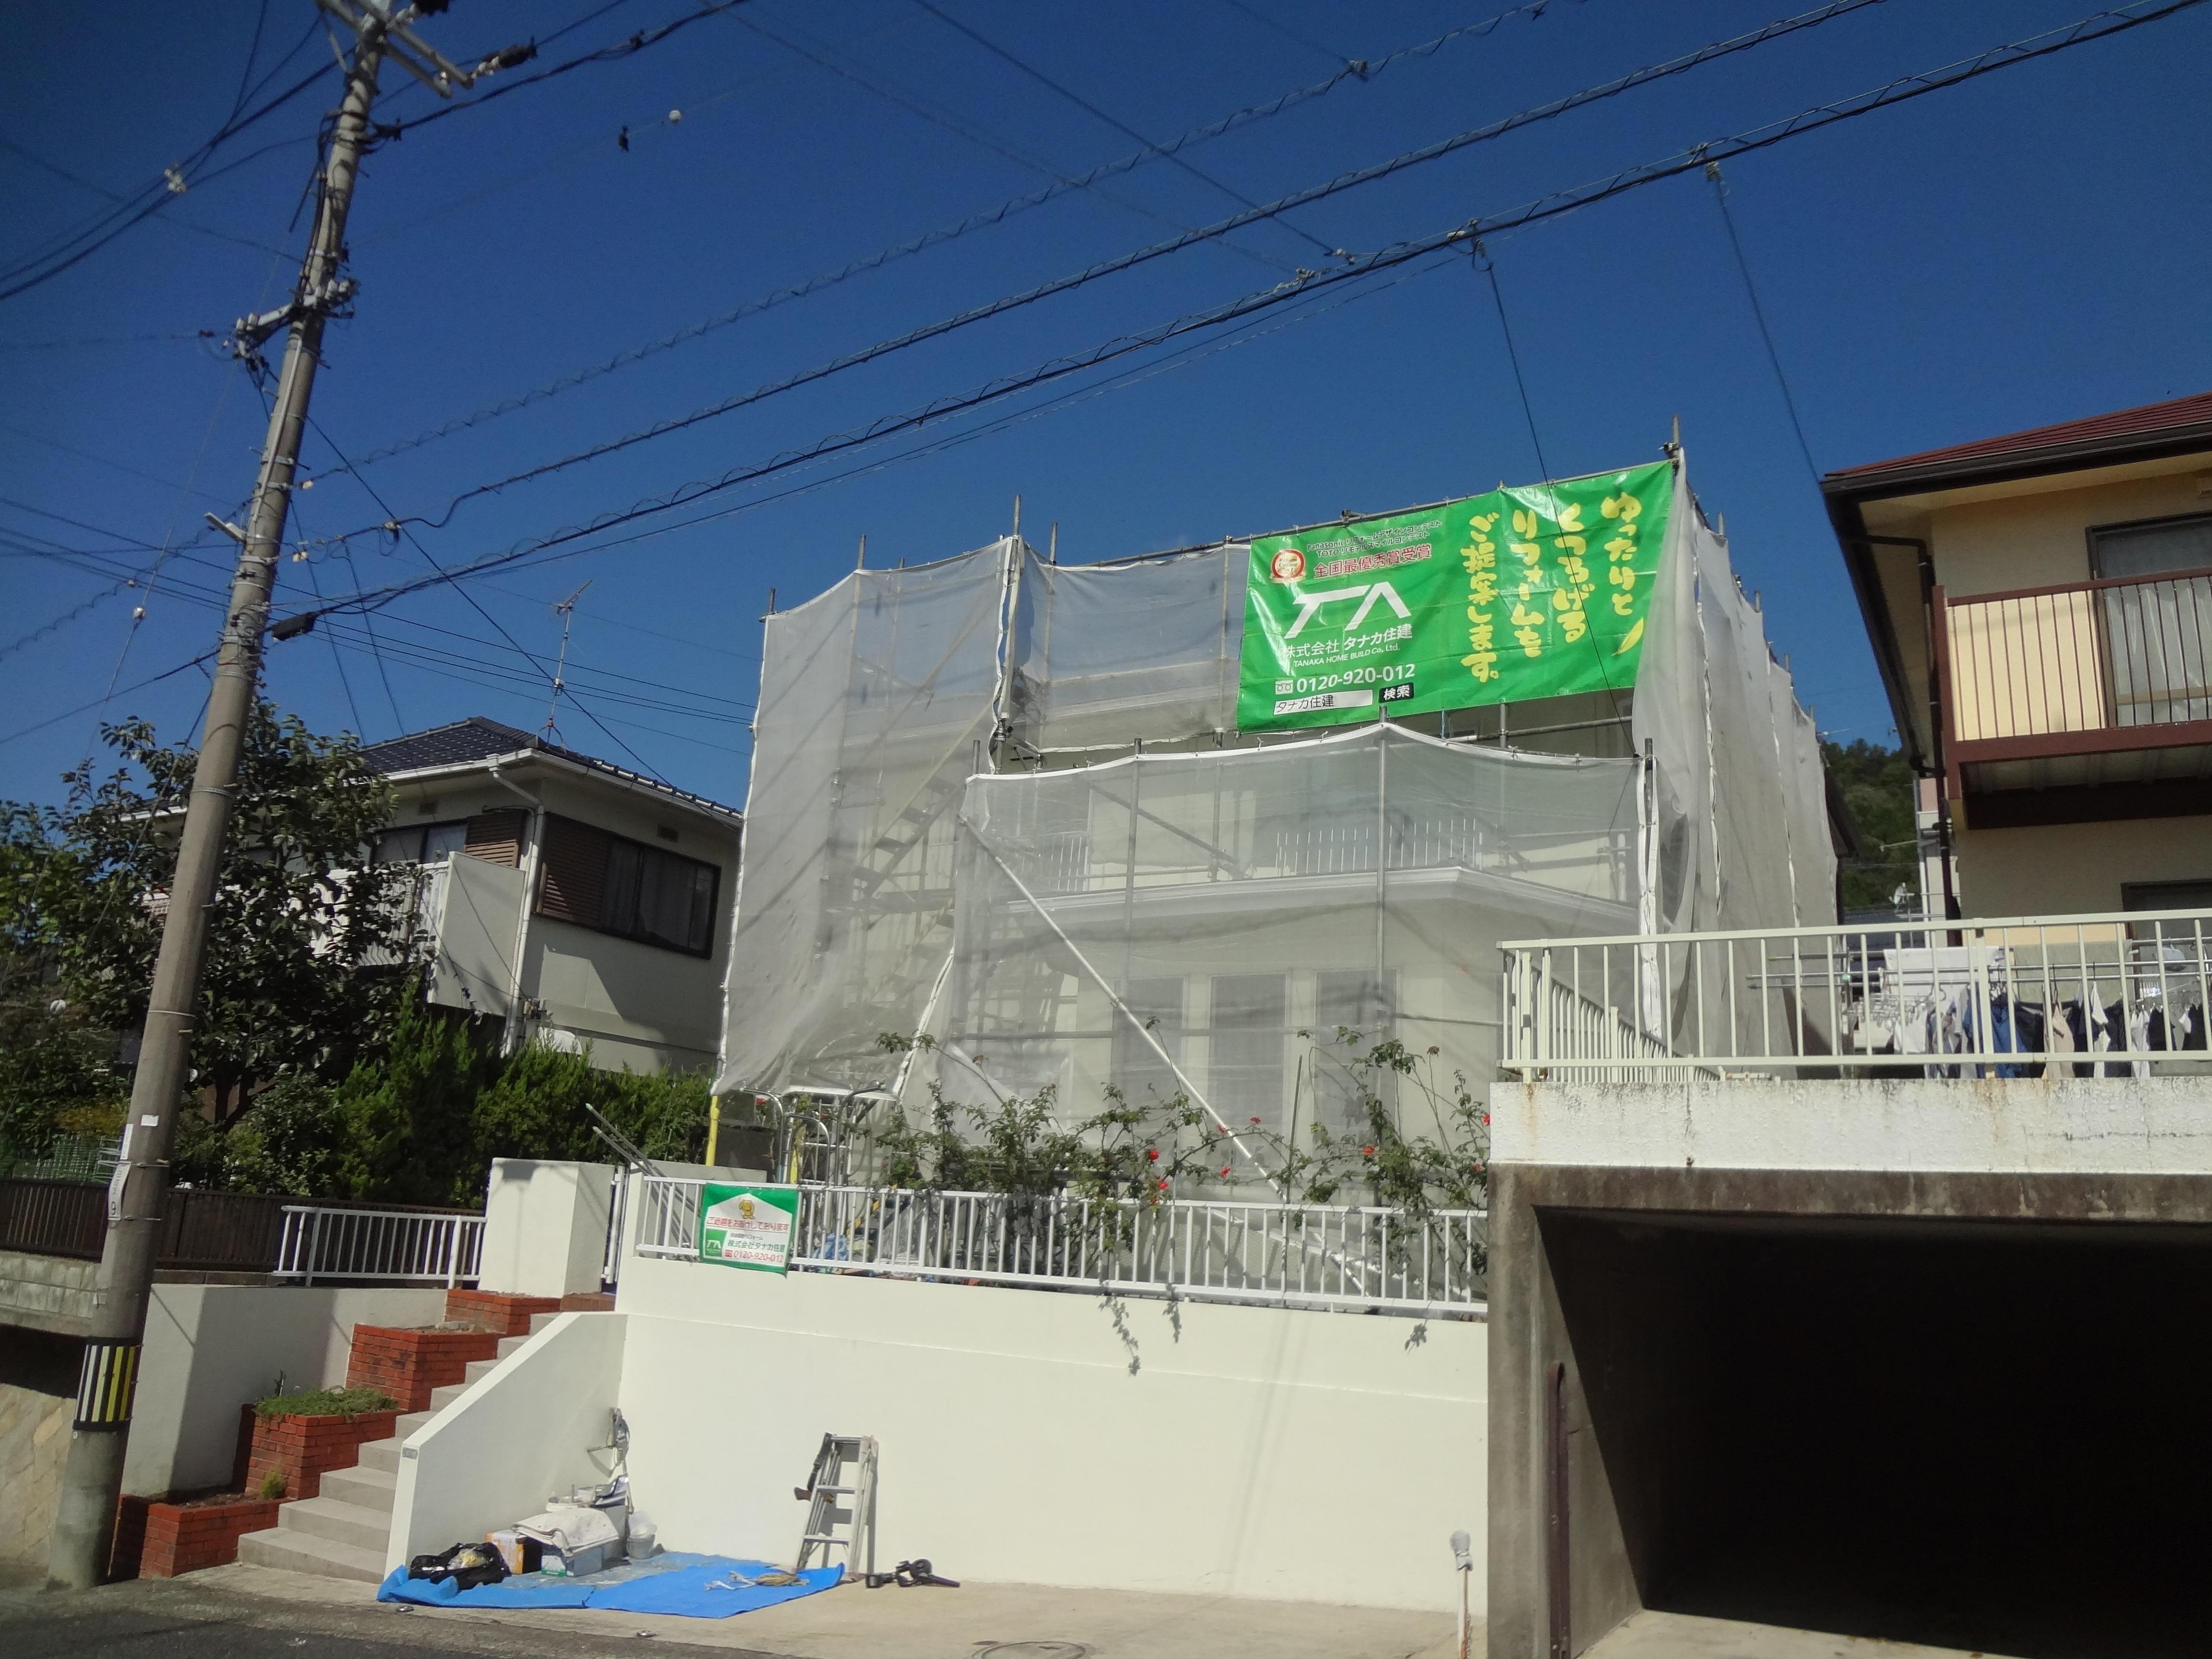 http://www.tanakajuken.com/blog/images/25cd0b240a39ea1f553458dbffd6a96a110c1fcb.JPG